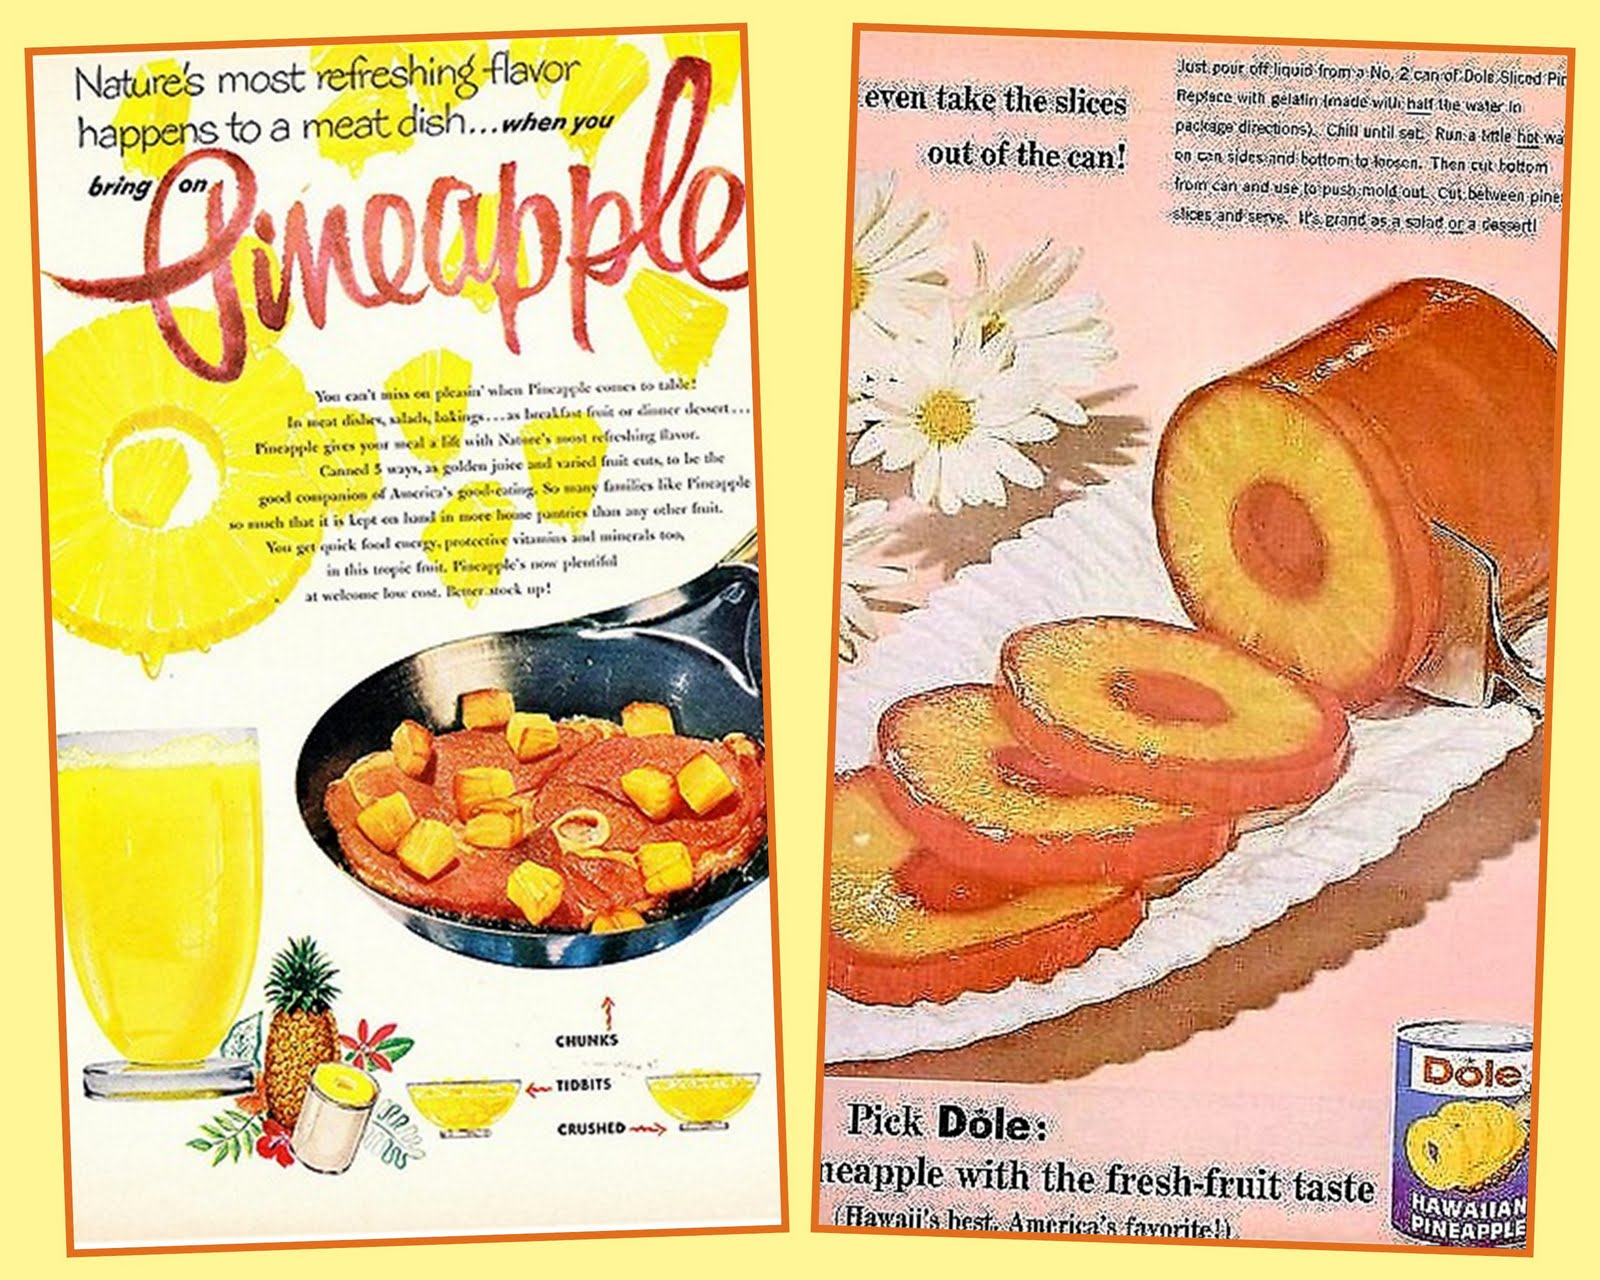 http://2.bp.blogspot.com/-81rznox-VJw/TXPAhWBrYmI/AAAAAAAAEe0/Kj8ev1UViSw/s1600/Pineapple%2Brecipes.jpg